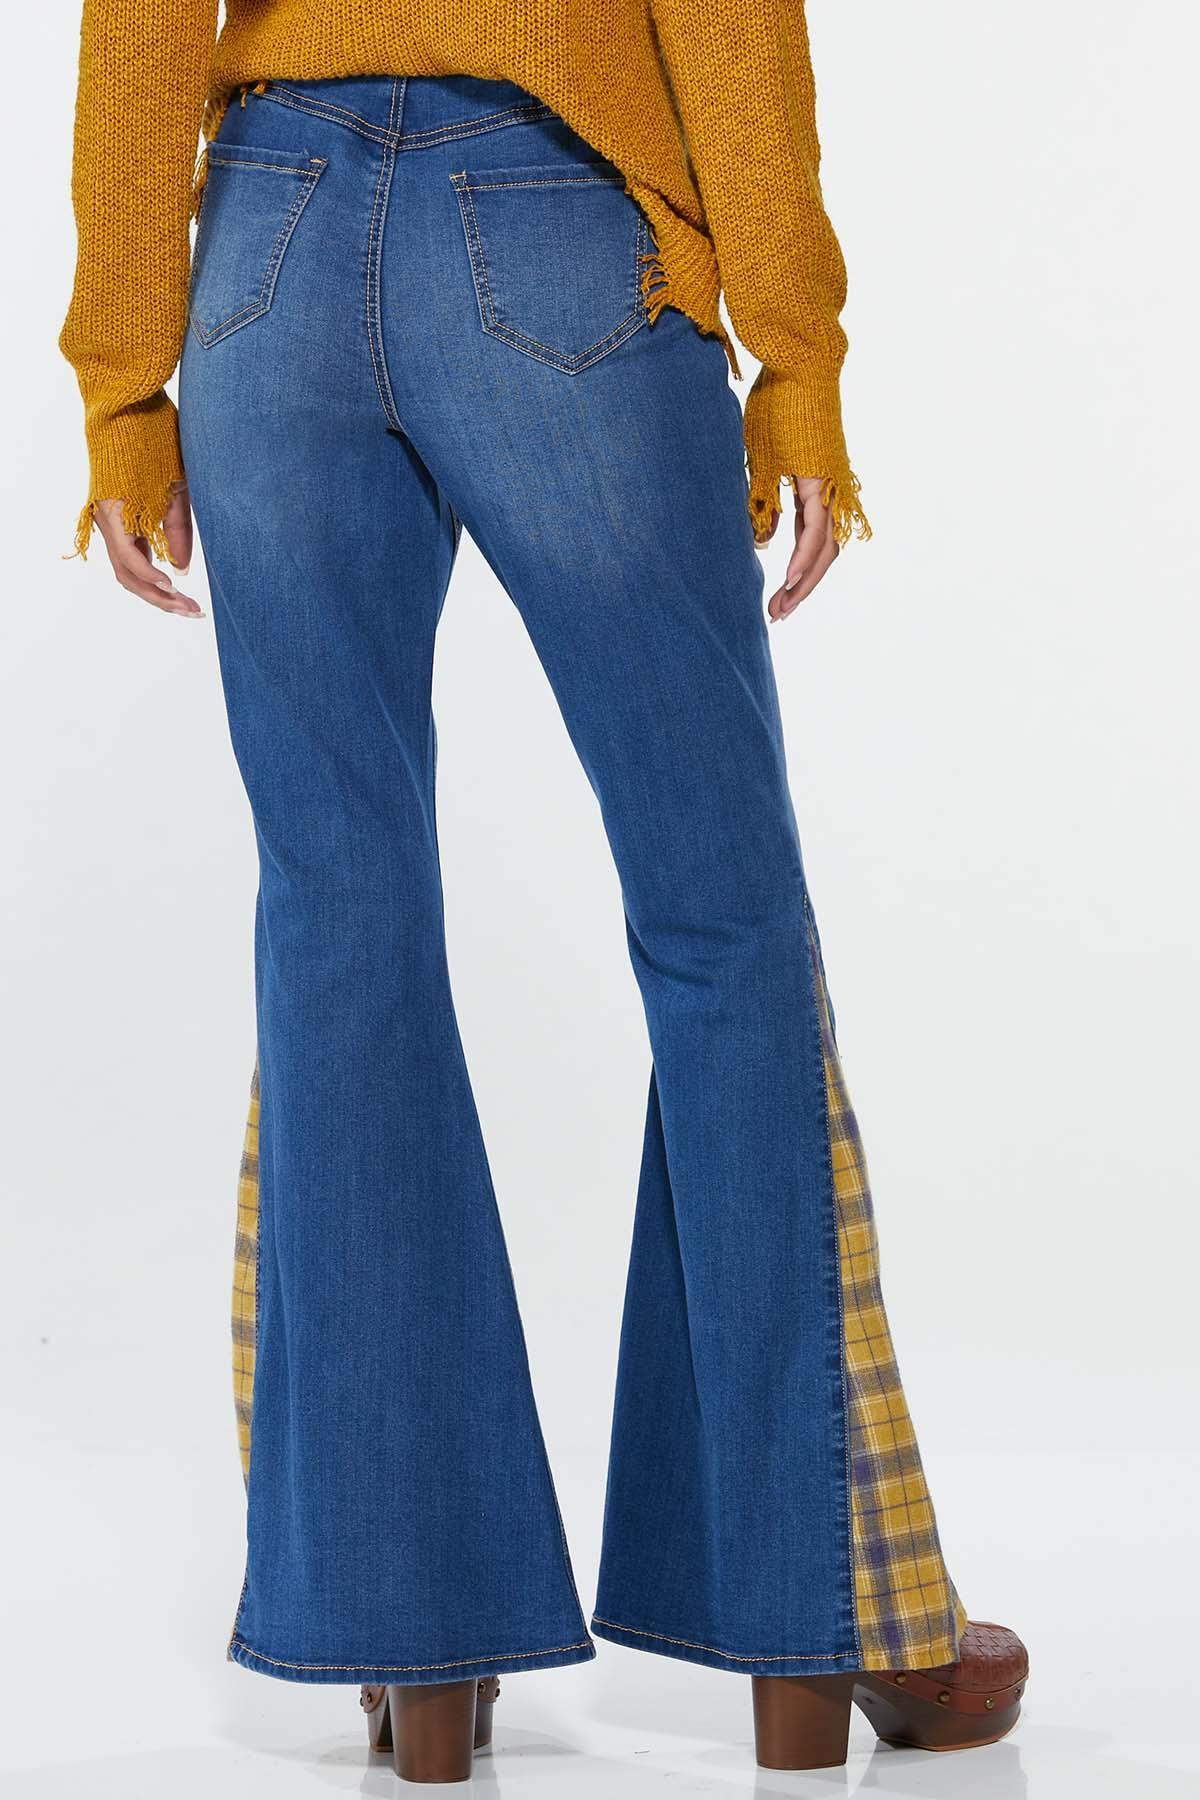 Plaid Inset Flare Jeans (Item #44702815)